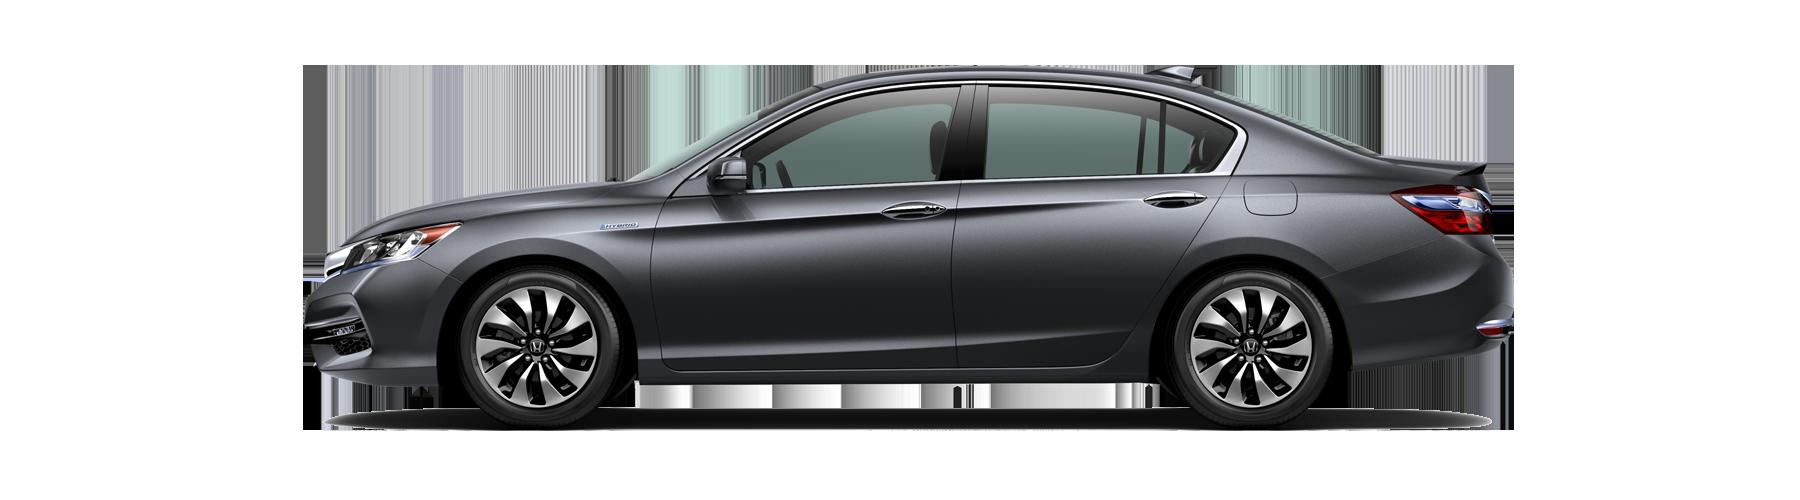 Boch Honda West 2016 Honda Fit Deals Prices Incentives